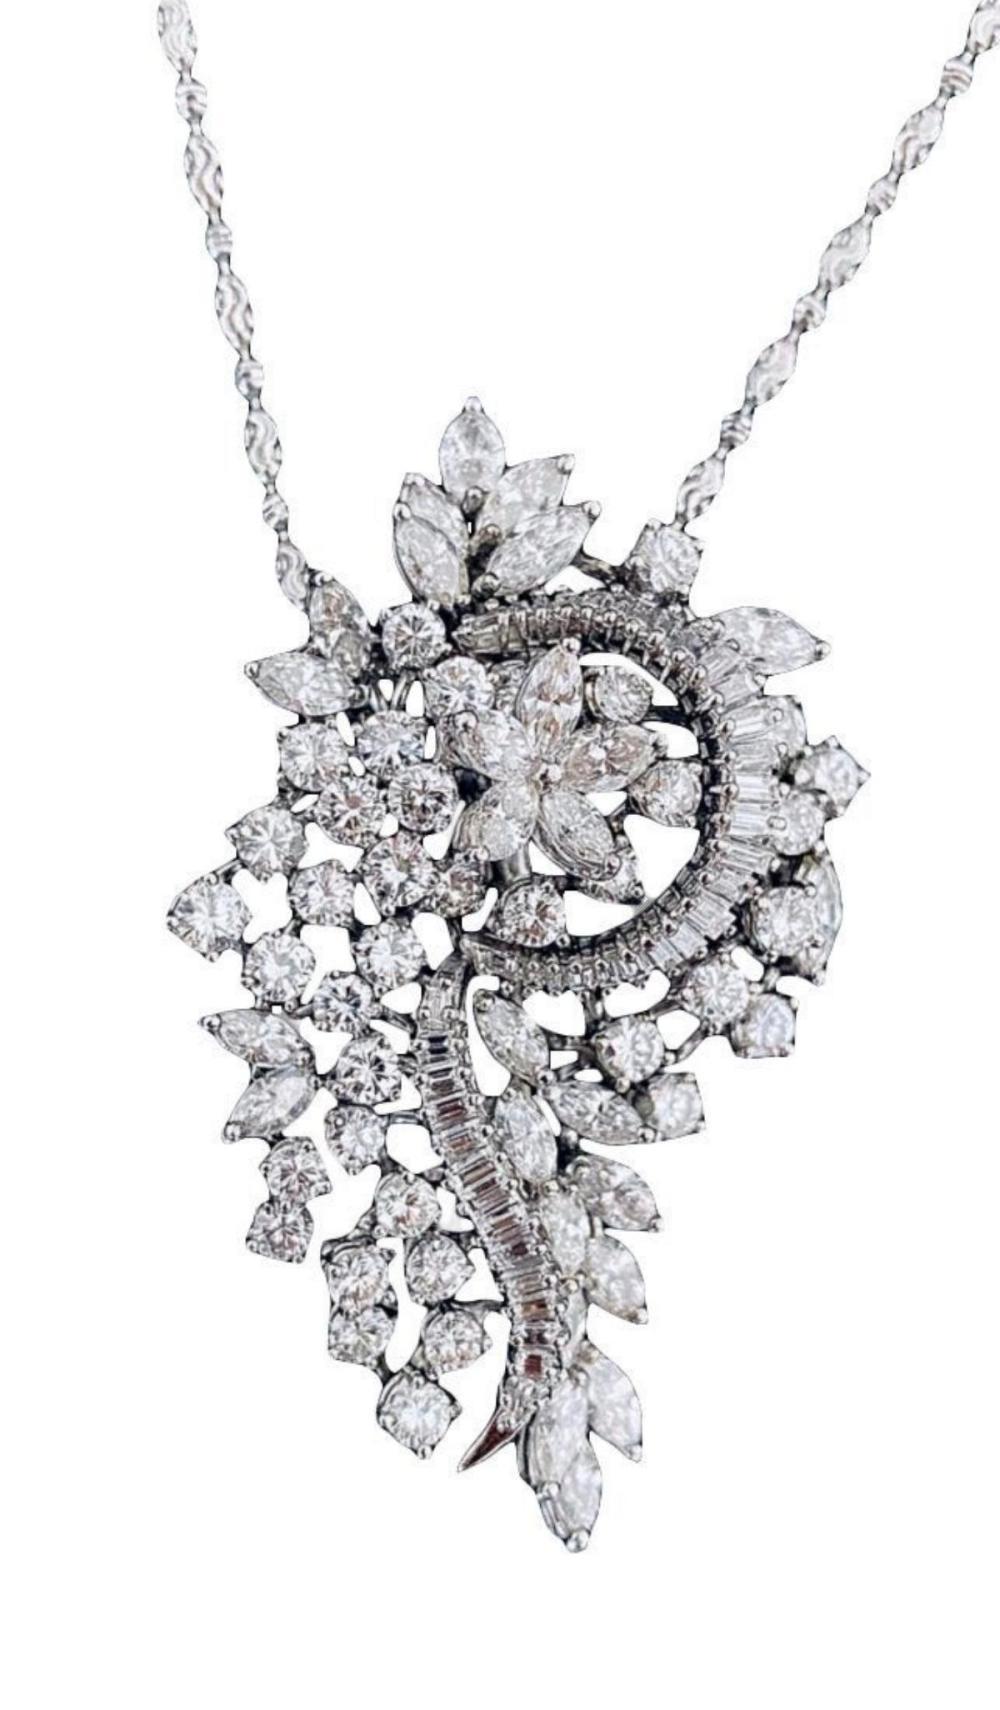 Rare 14Kt 10.48ct. Diamond Pendant w/ Necklace